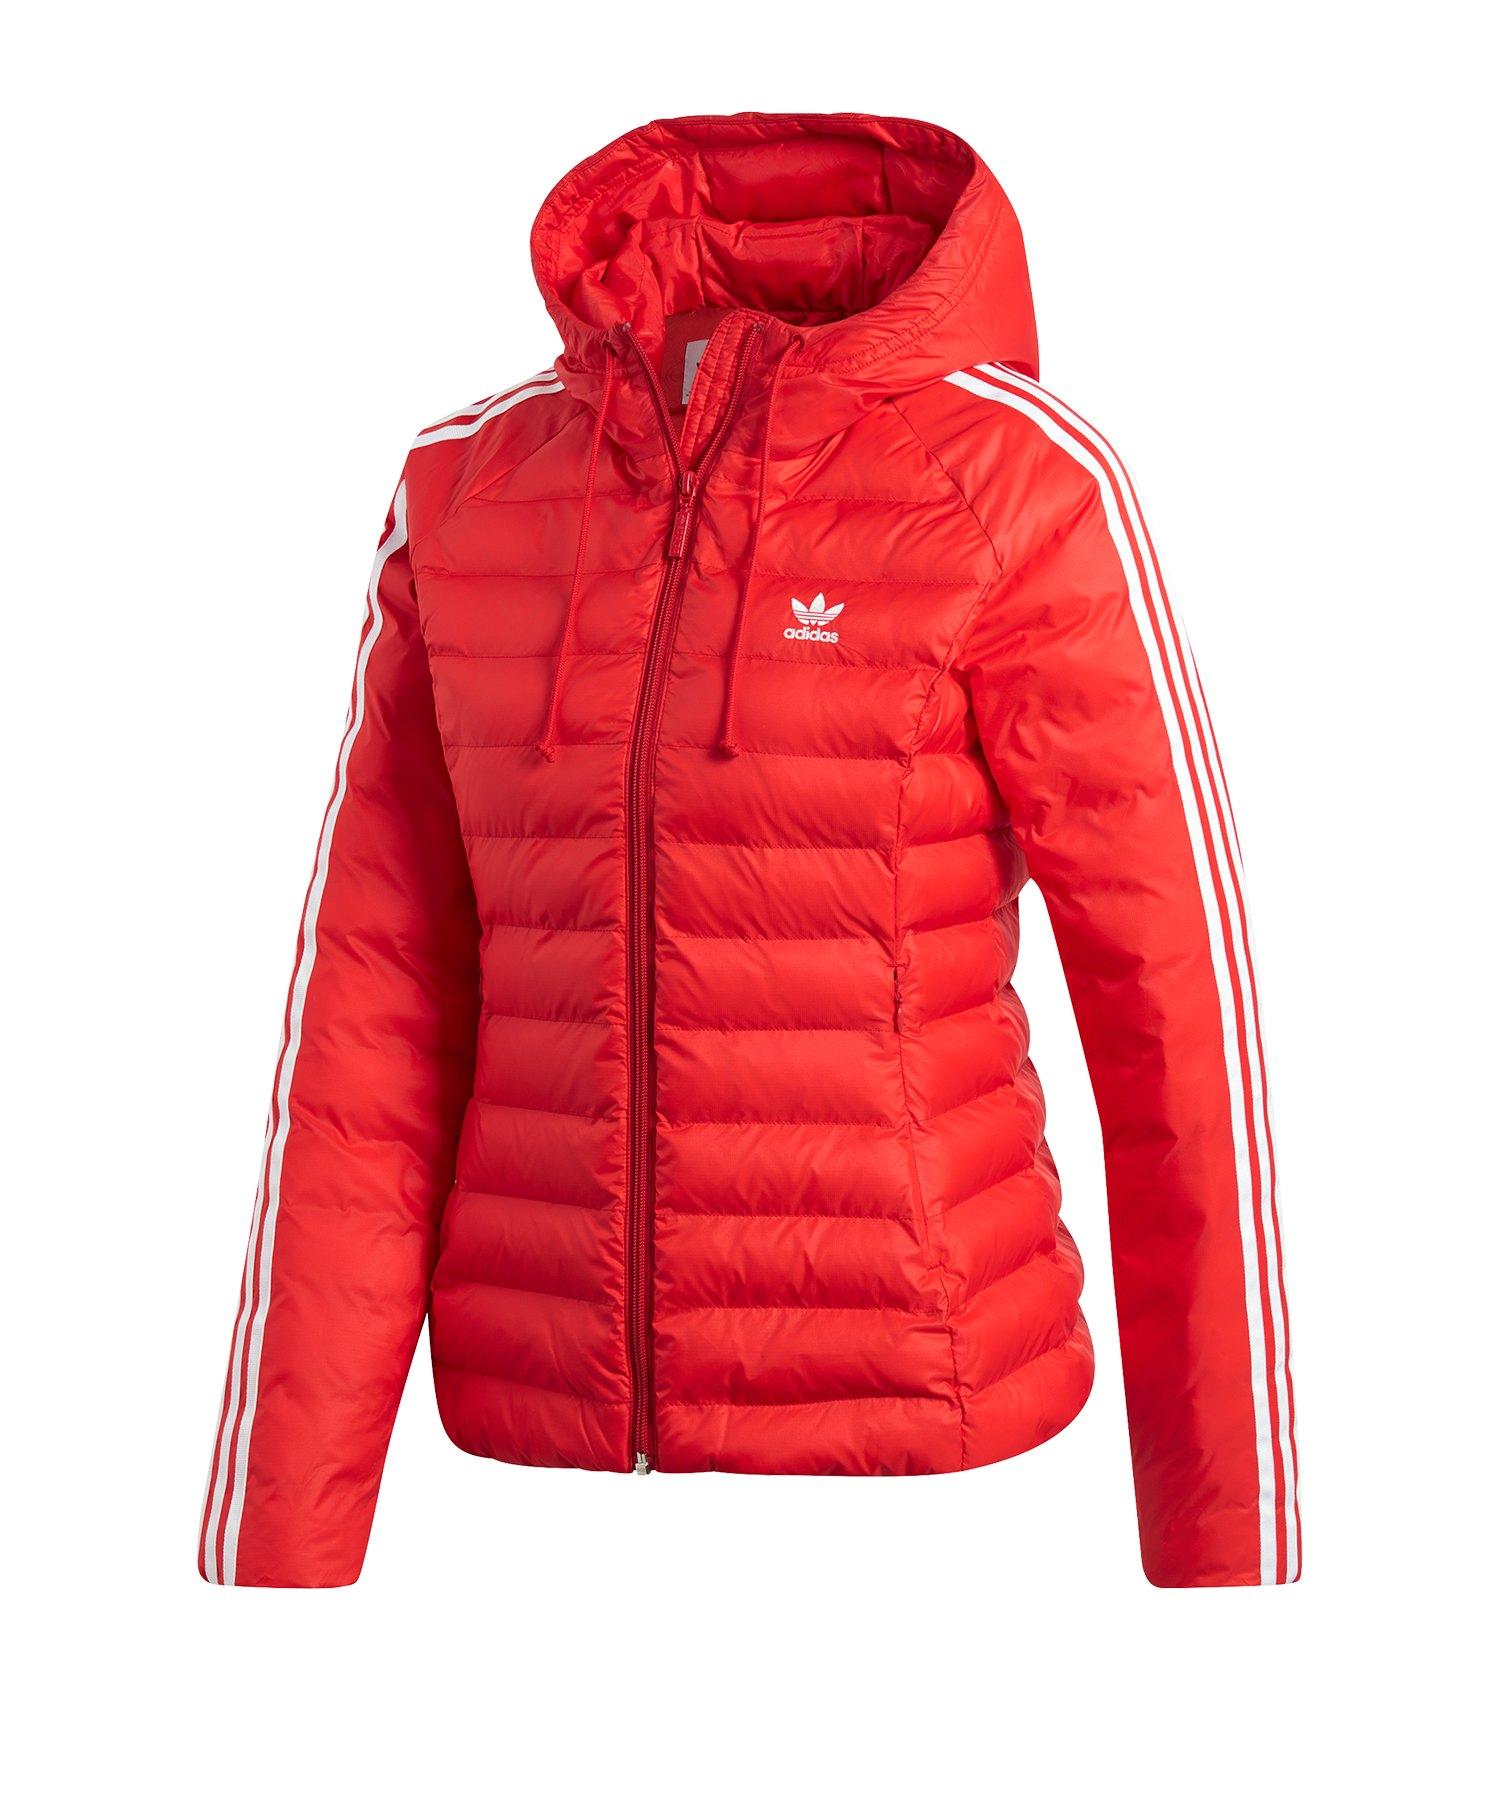 adidas Originals Jacket Jacke Damen Rot